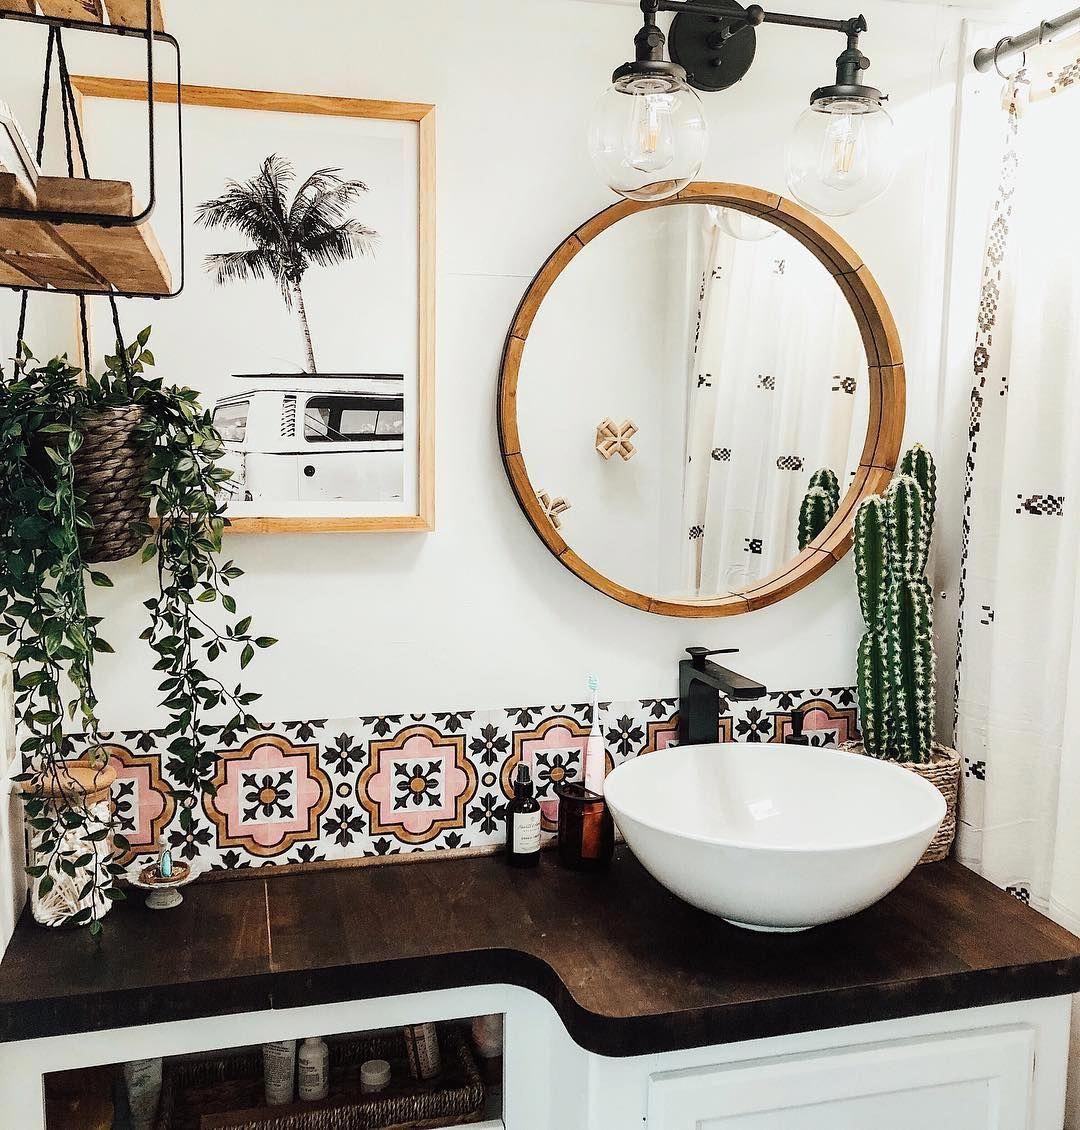 Tiny Bathroom Washing Machine Bathroompaint2018 Bathroomideashos Code 2754831614 Vinyl Tile Boho Bathroom Tile Bathroom